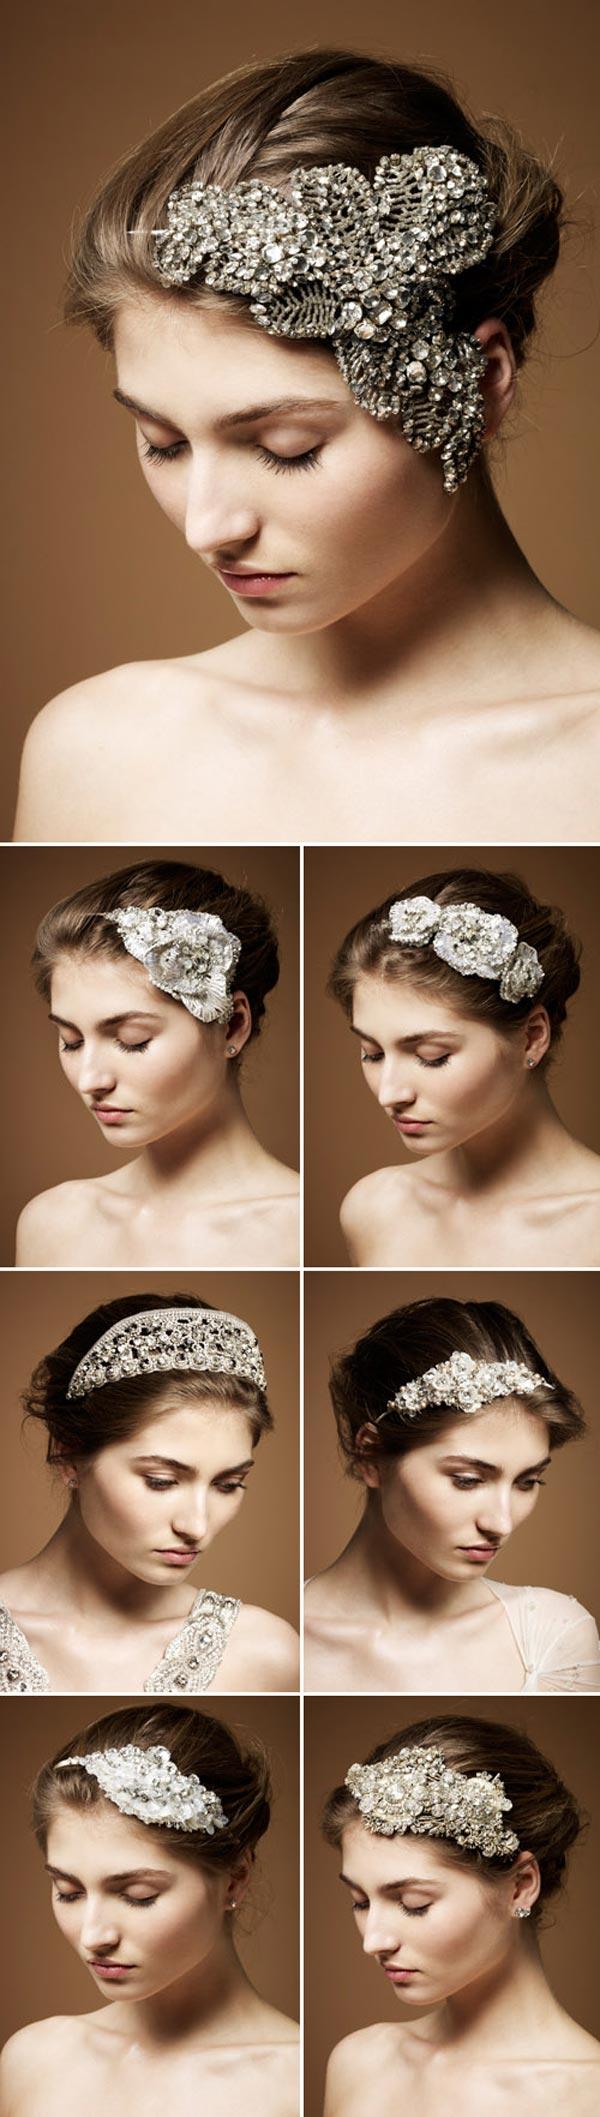 weddingstylist jenny packma Αξεσουάρ για τα μαλλάκια από την Jenny Packham